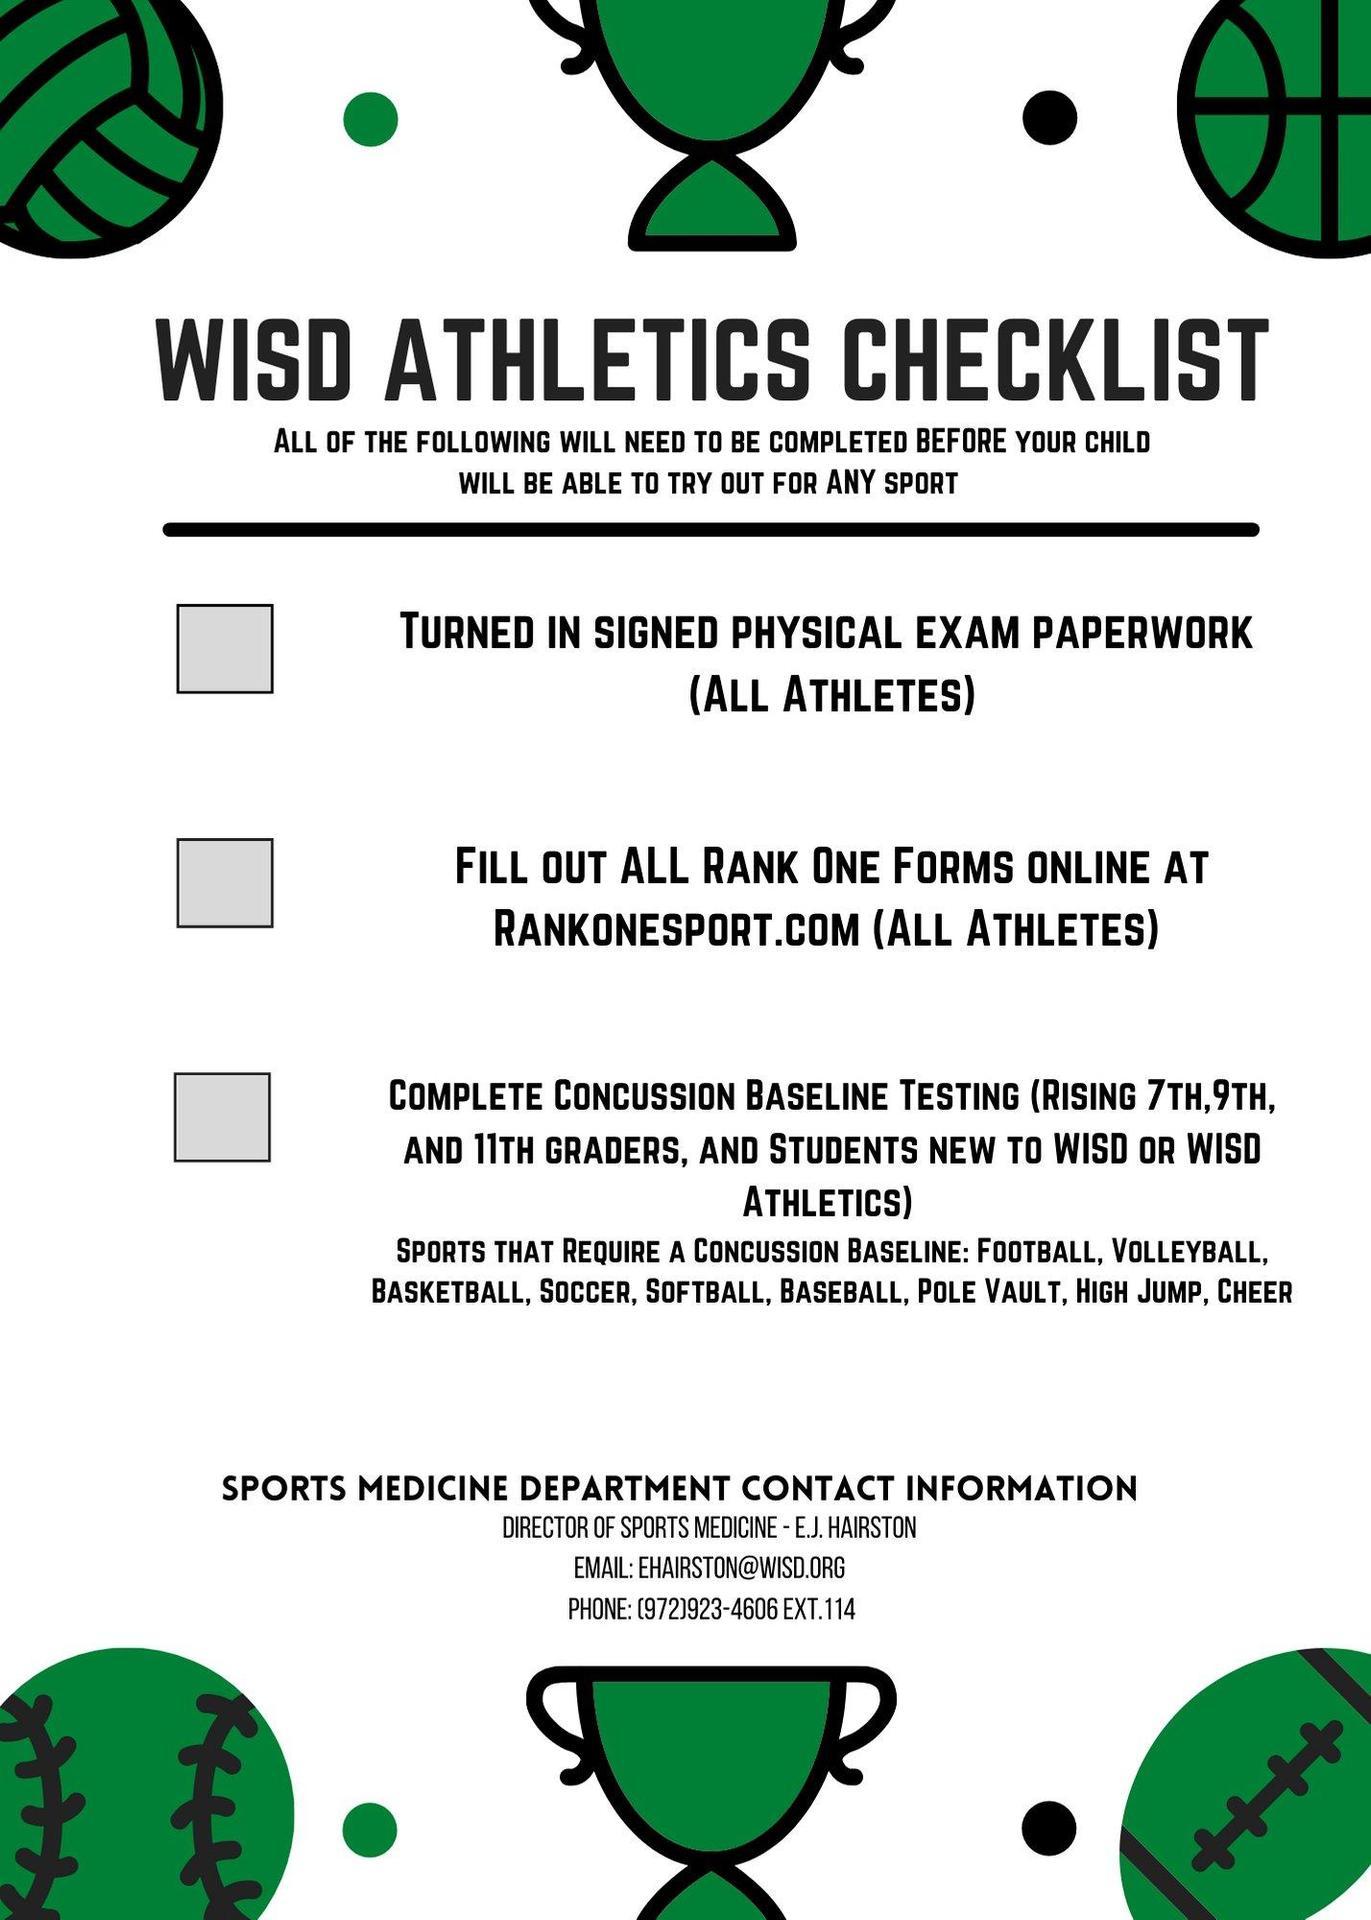 graphic of wisd athletics checklist